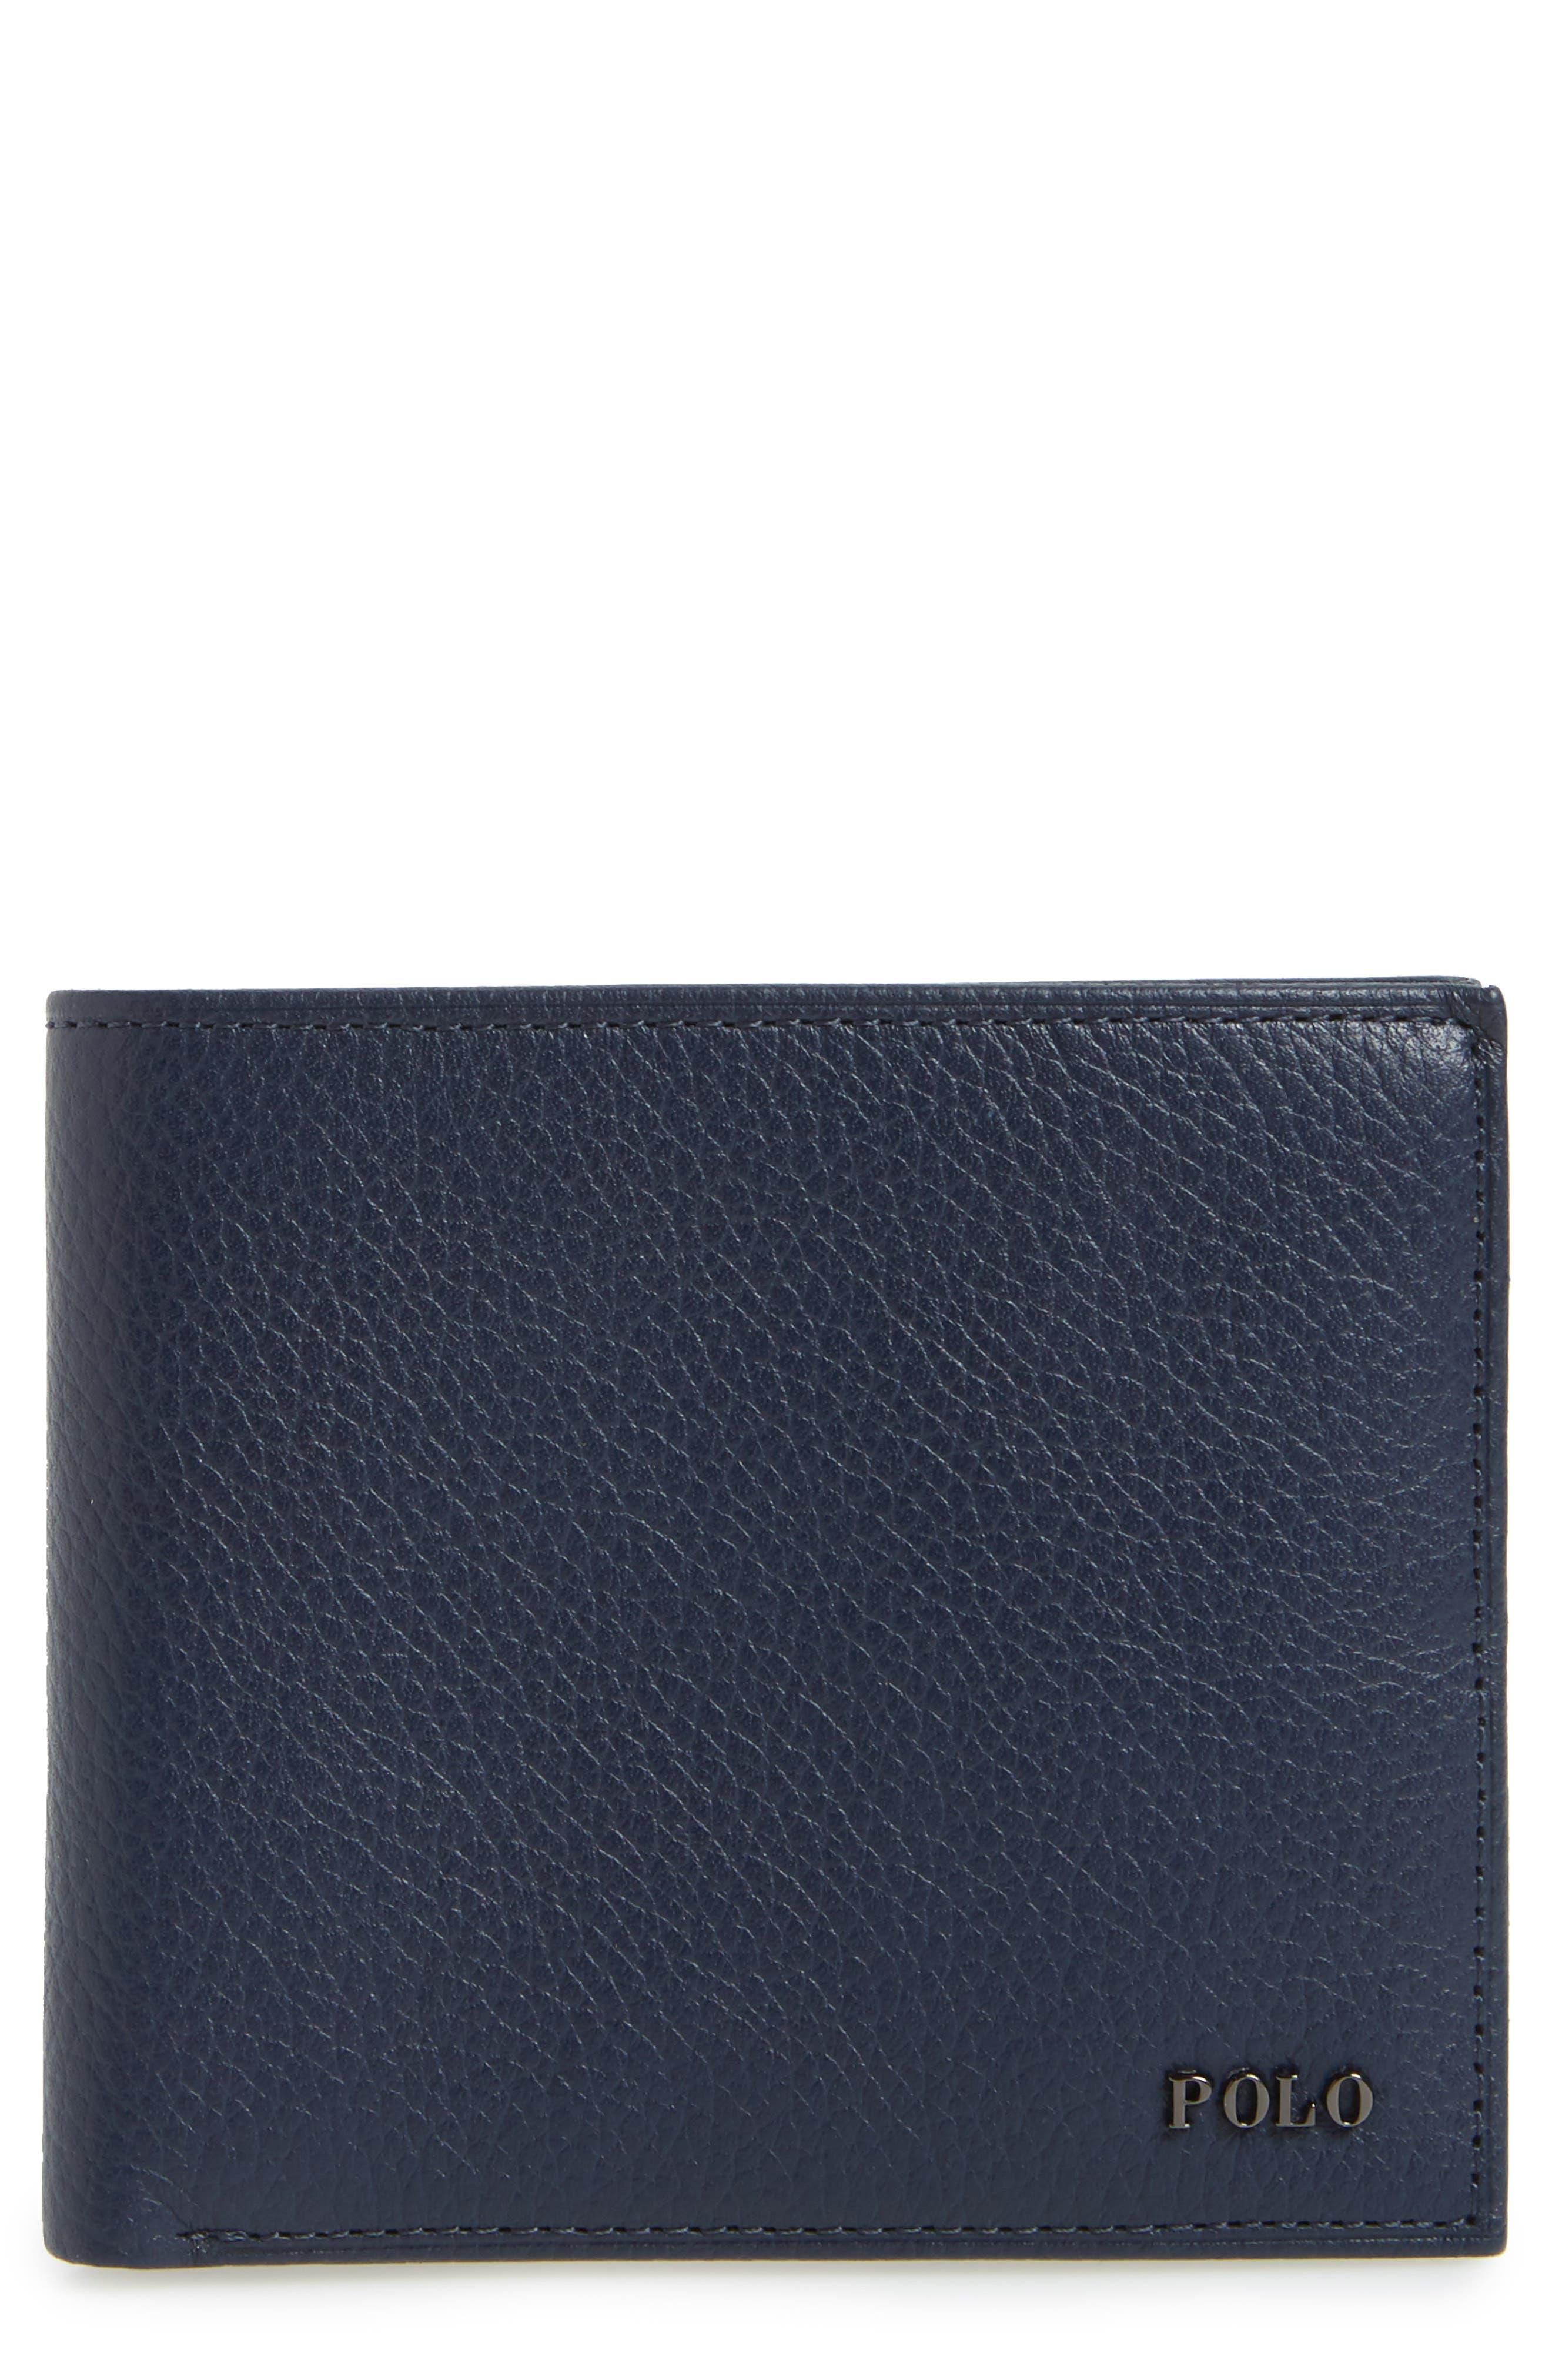 Leather Wallet,                         Main,                         color, Blue